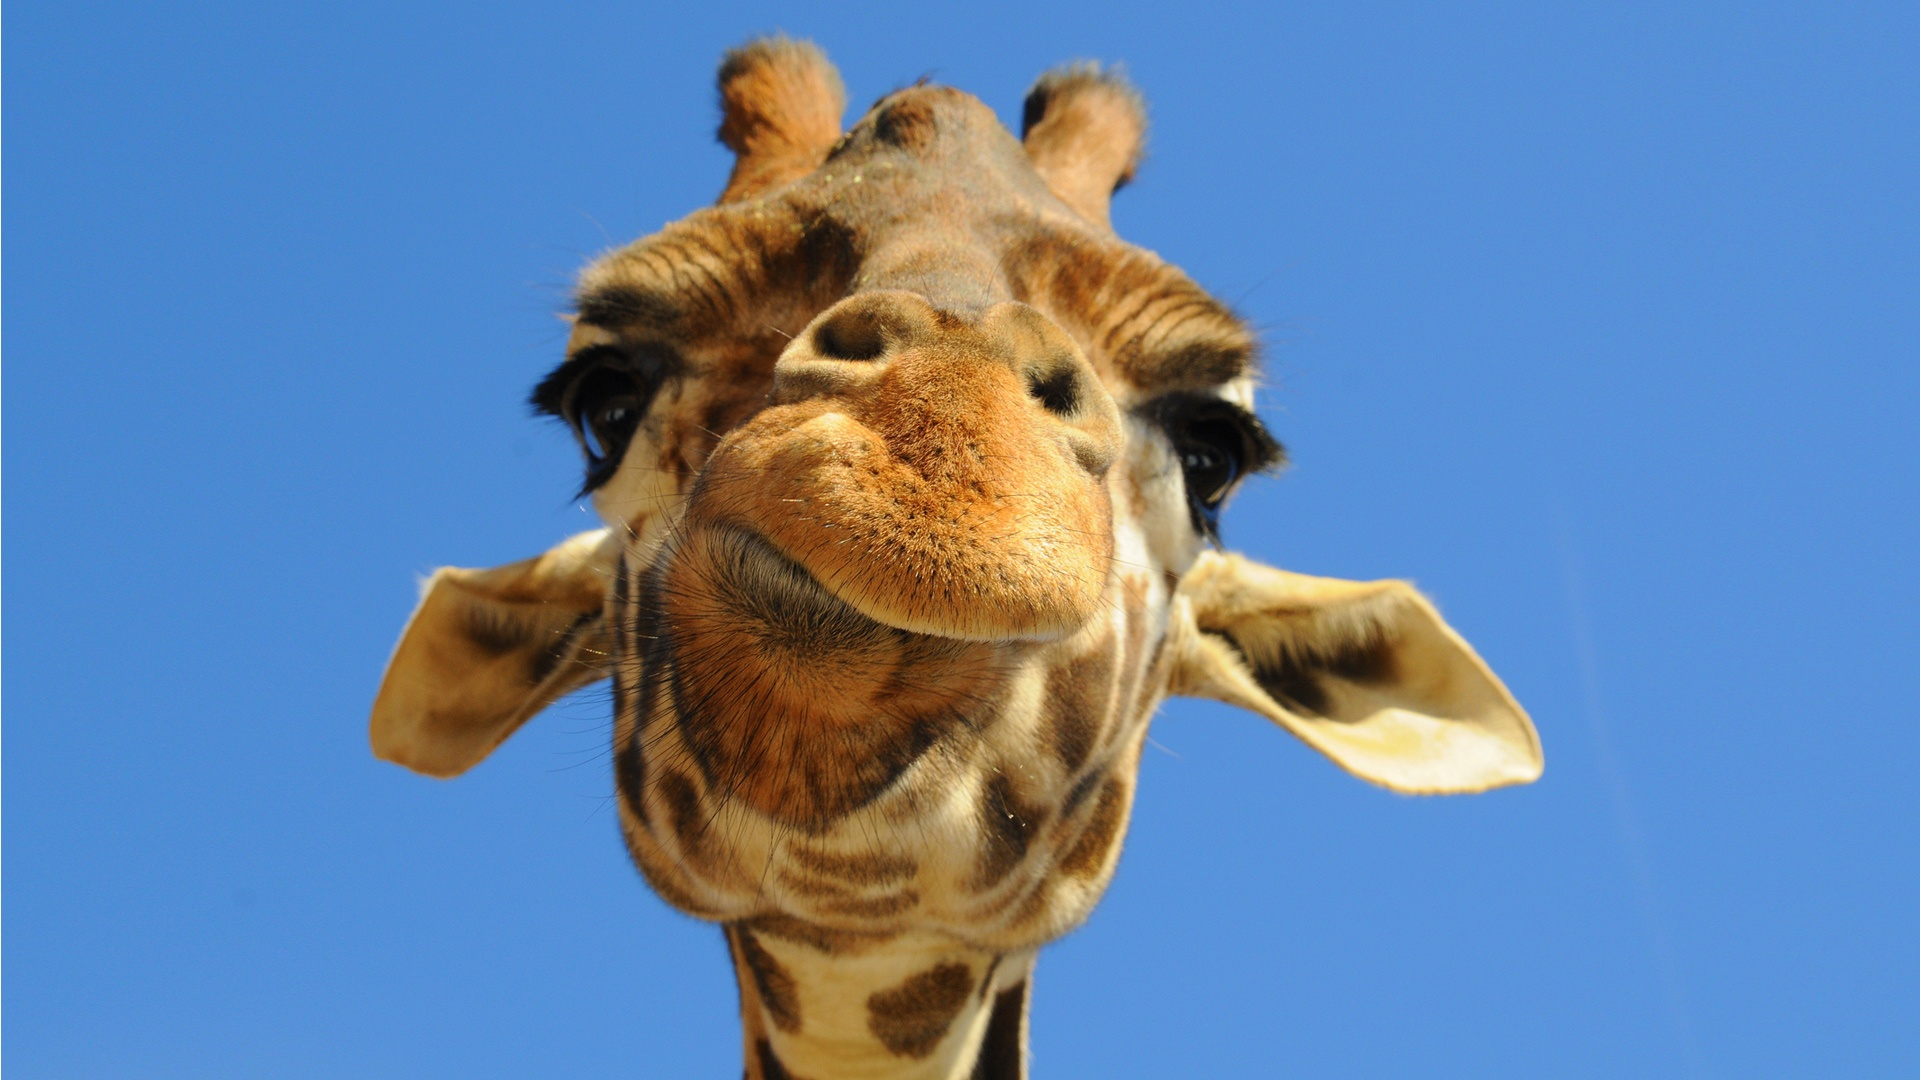 yawning giraffe - photo #11